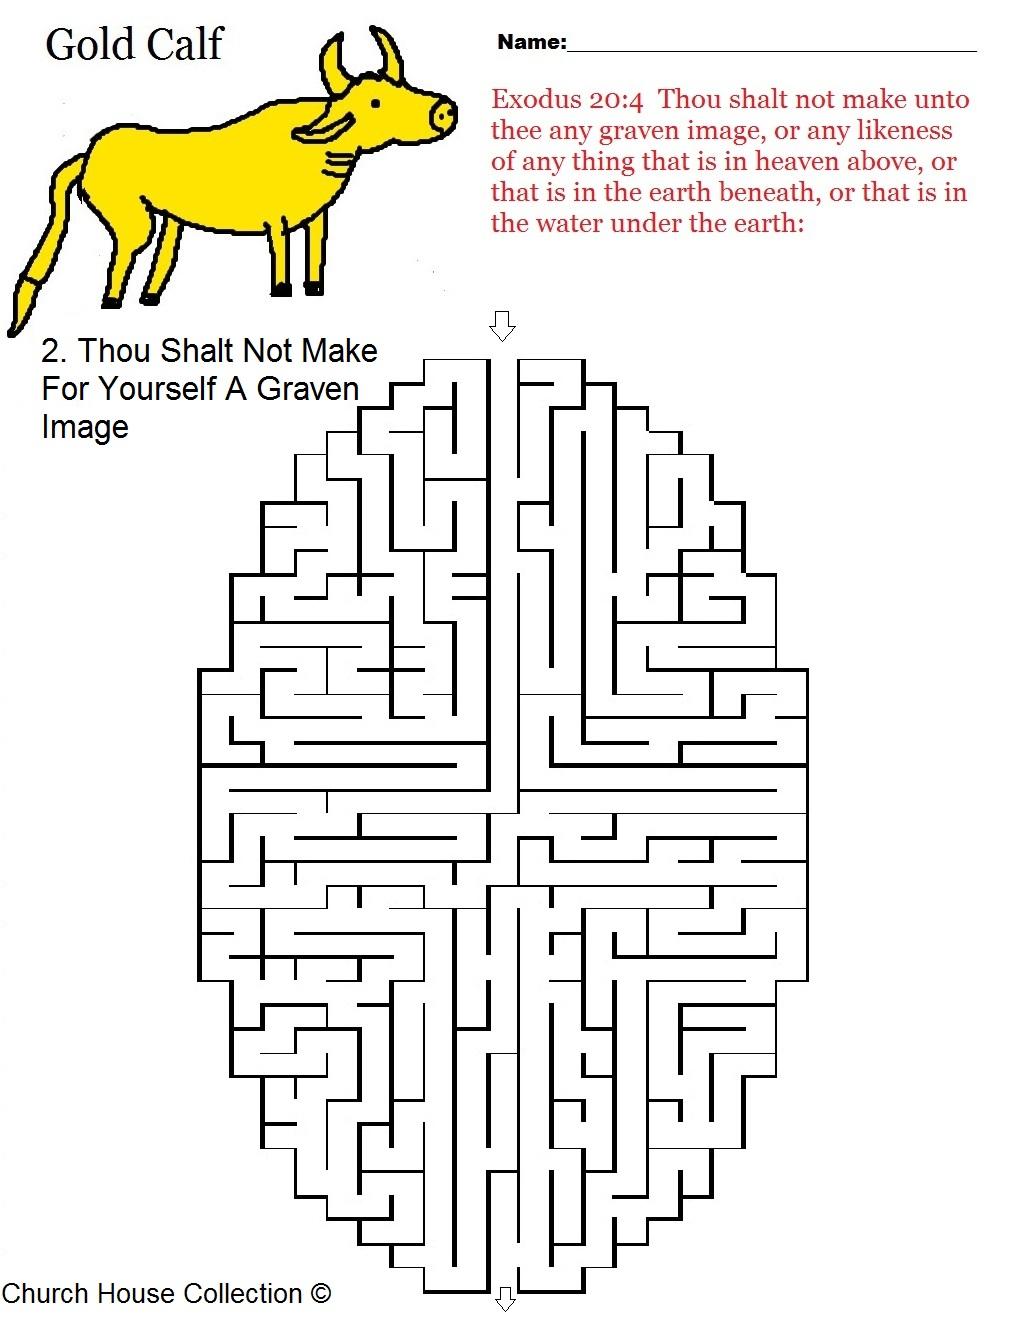 Free coloring page golden calf - Ten Commandments Maze Thou Shalt Not Make For Yourself A Graven Image Gold Calf Exodus 20 4